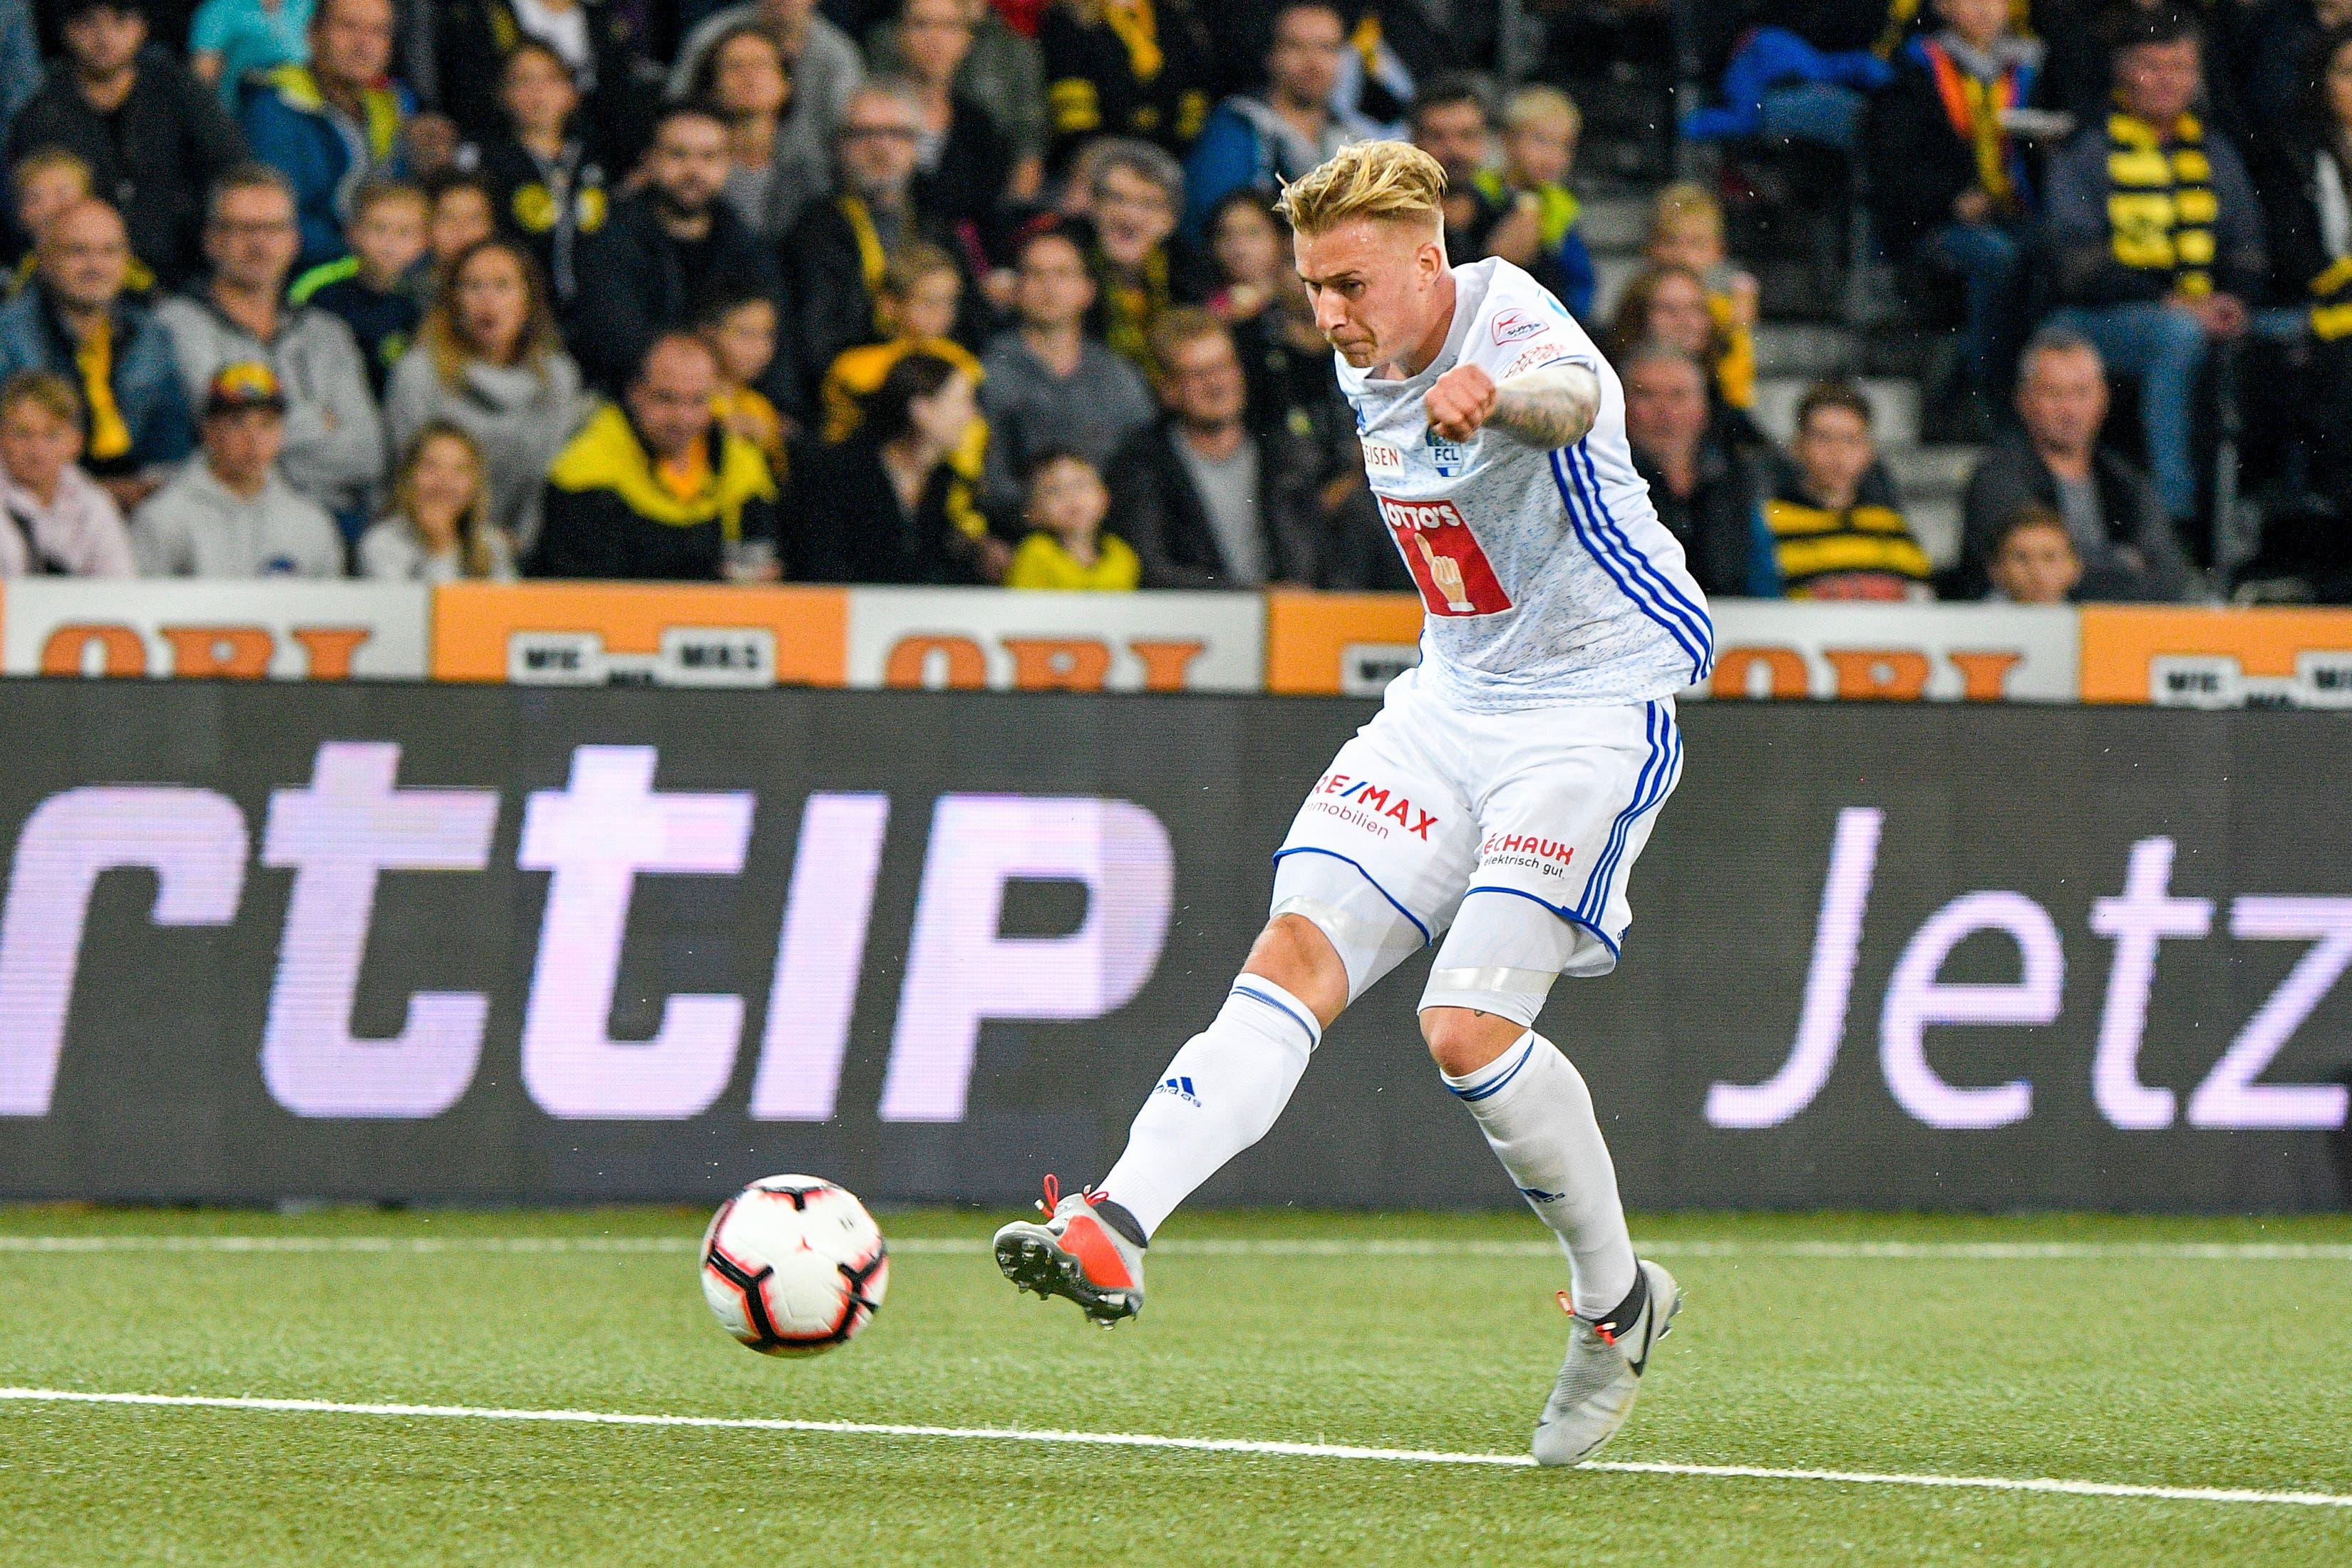 Marvin Schulz (Luzern) erzielt das Tor zum 2:2. (Bild: Martin Meienberger/freshfocus (Bern, 6. Oktober 2018))